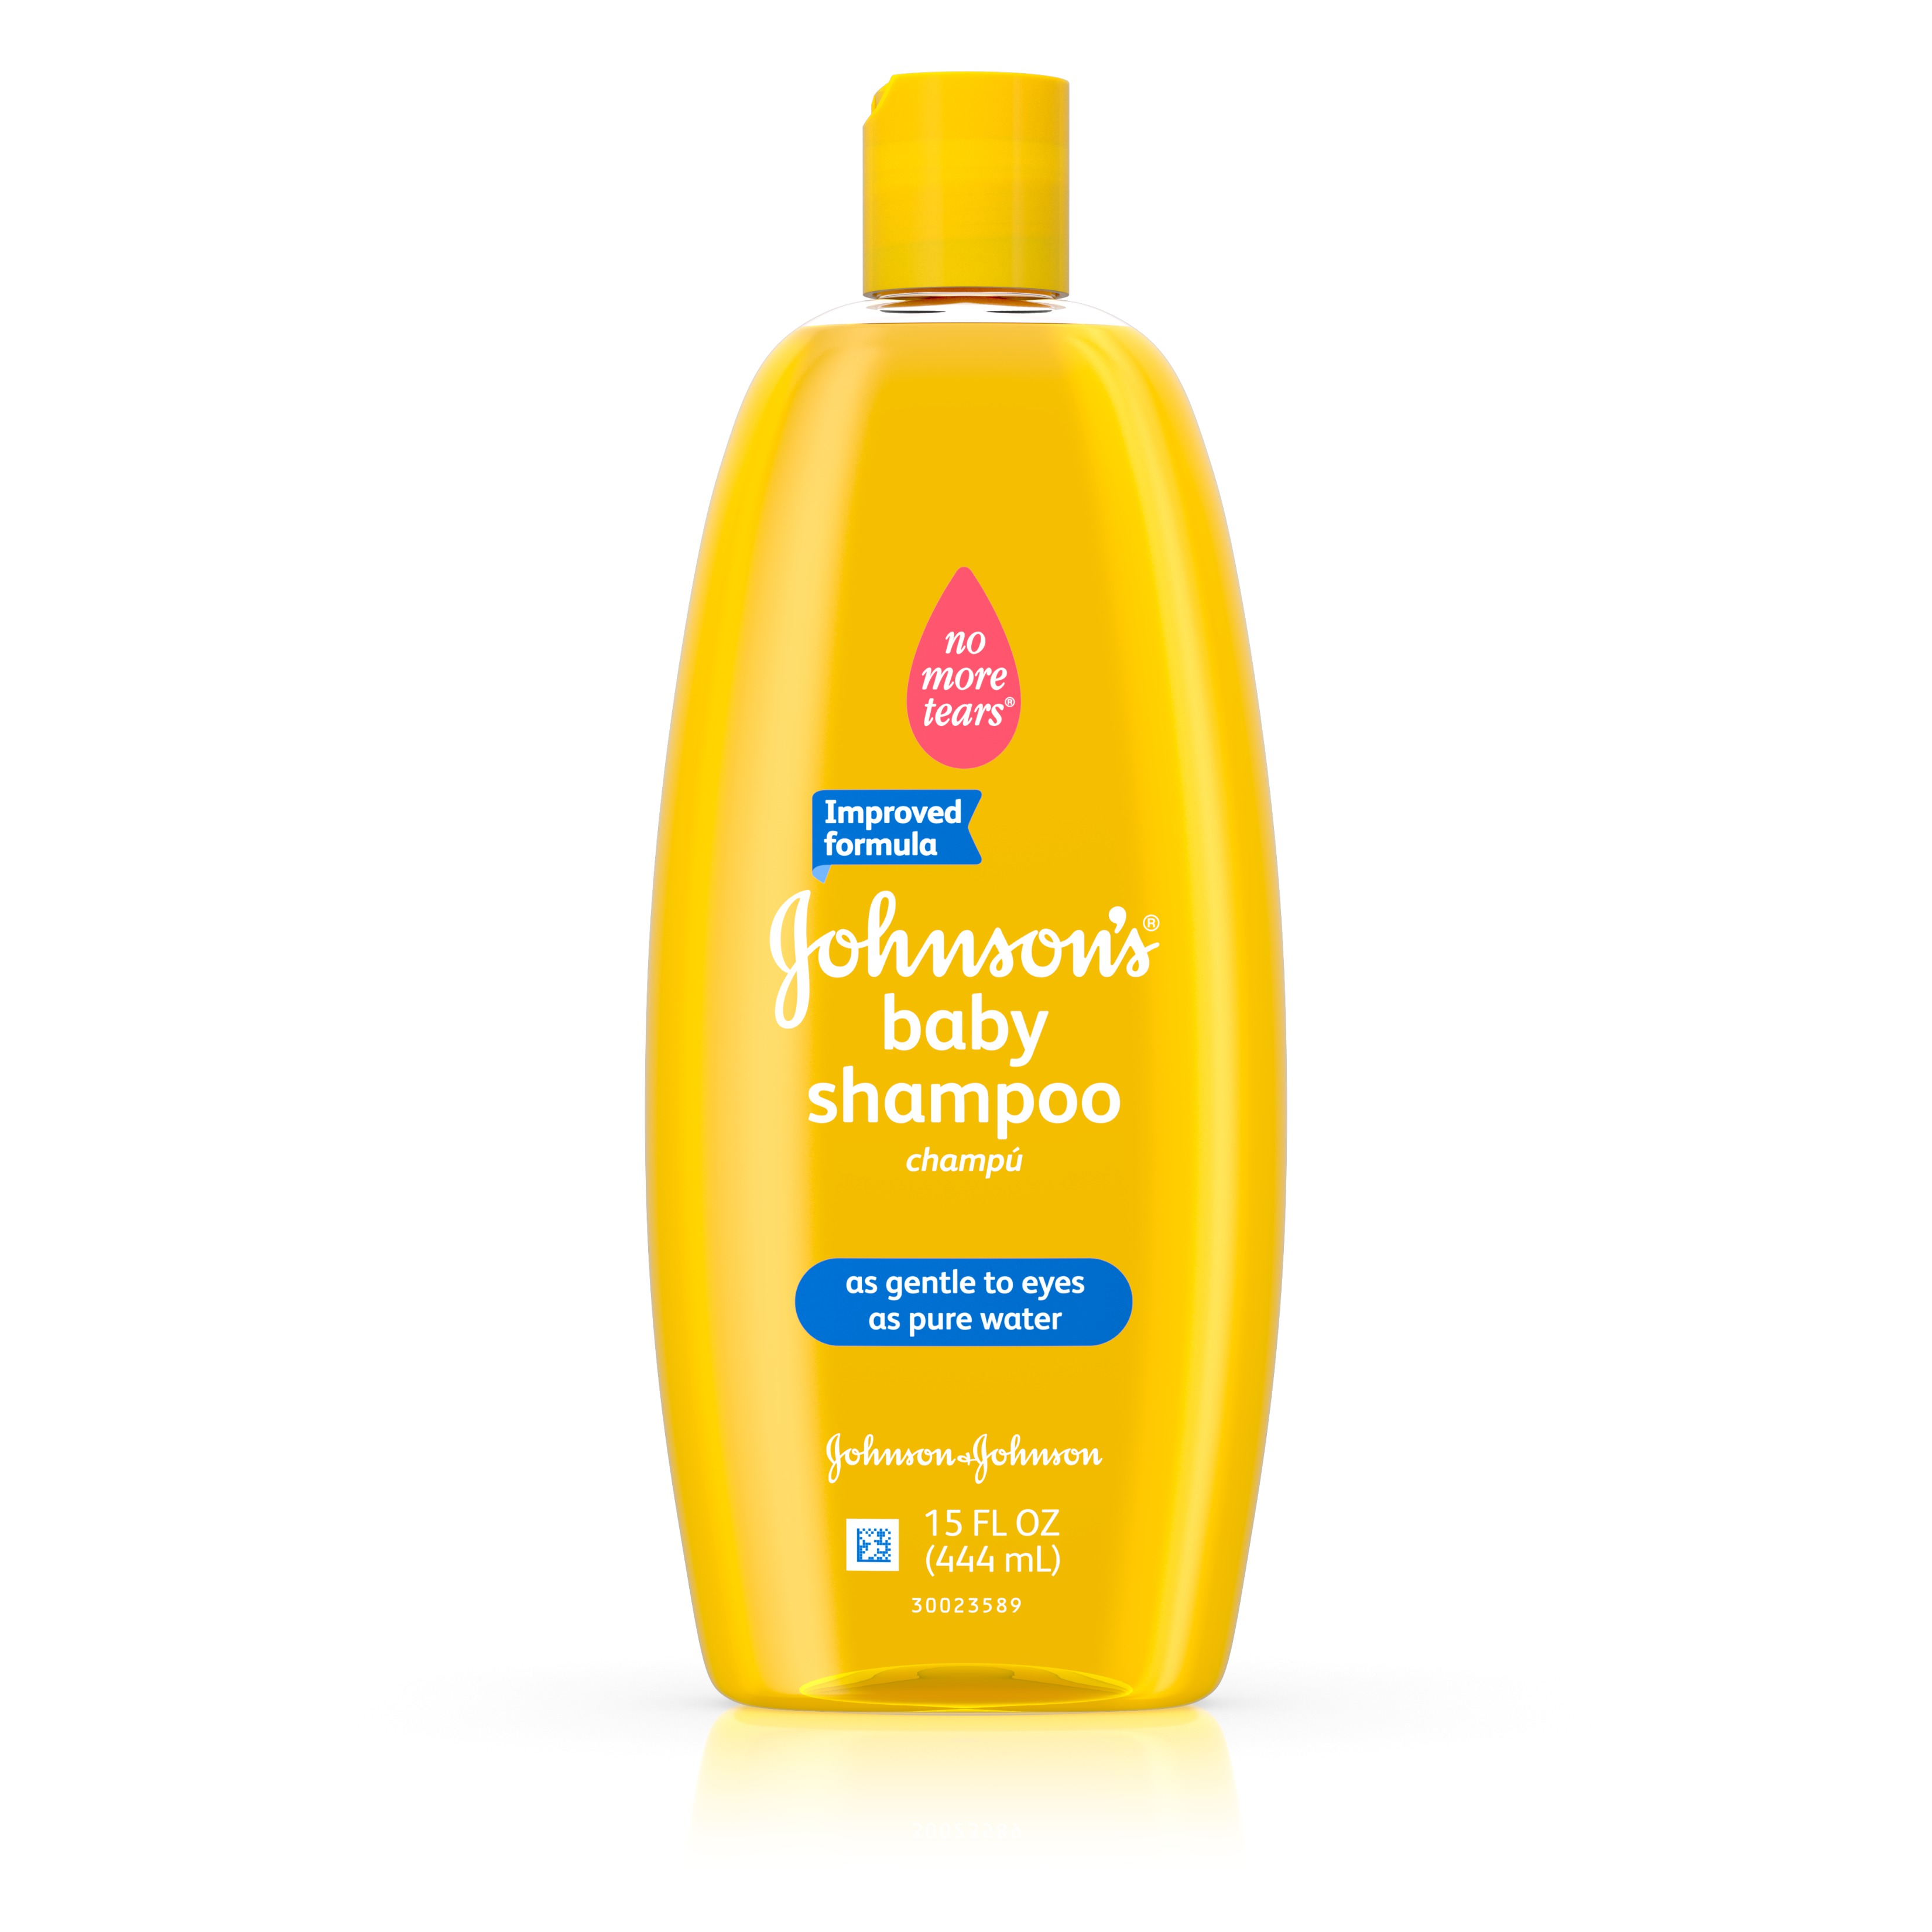 Johnson's Baby Gentle Cleansing Shampoo, 15 Fl. Oz.